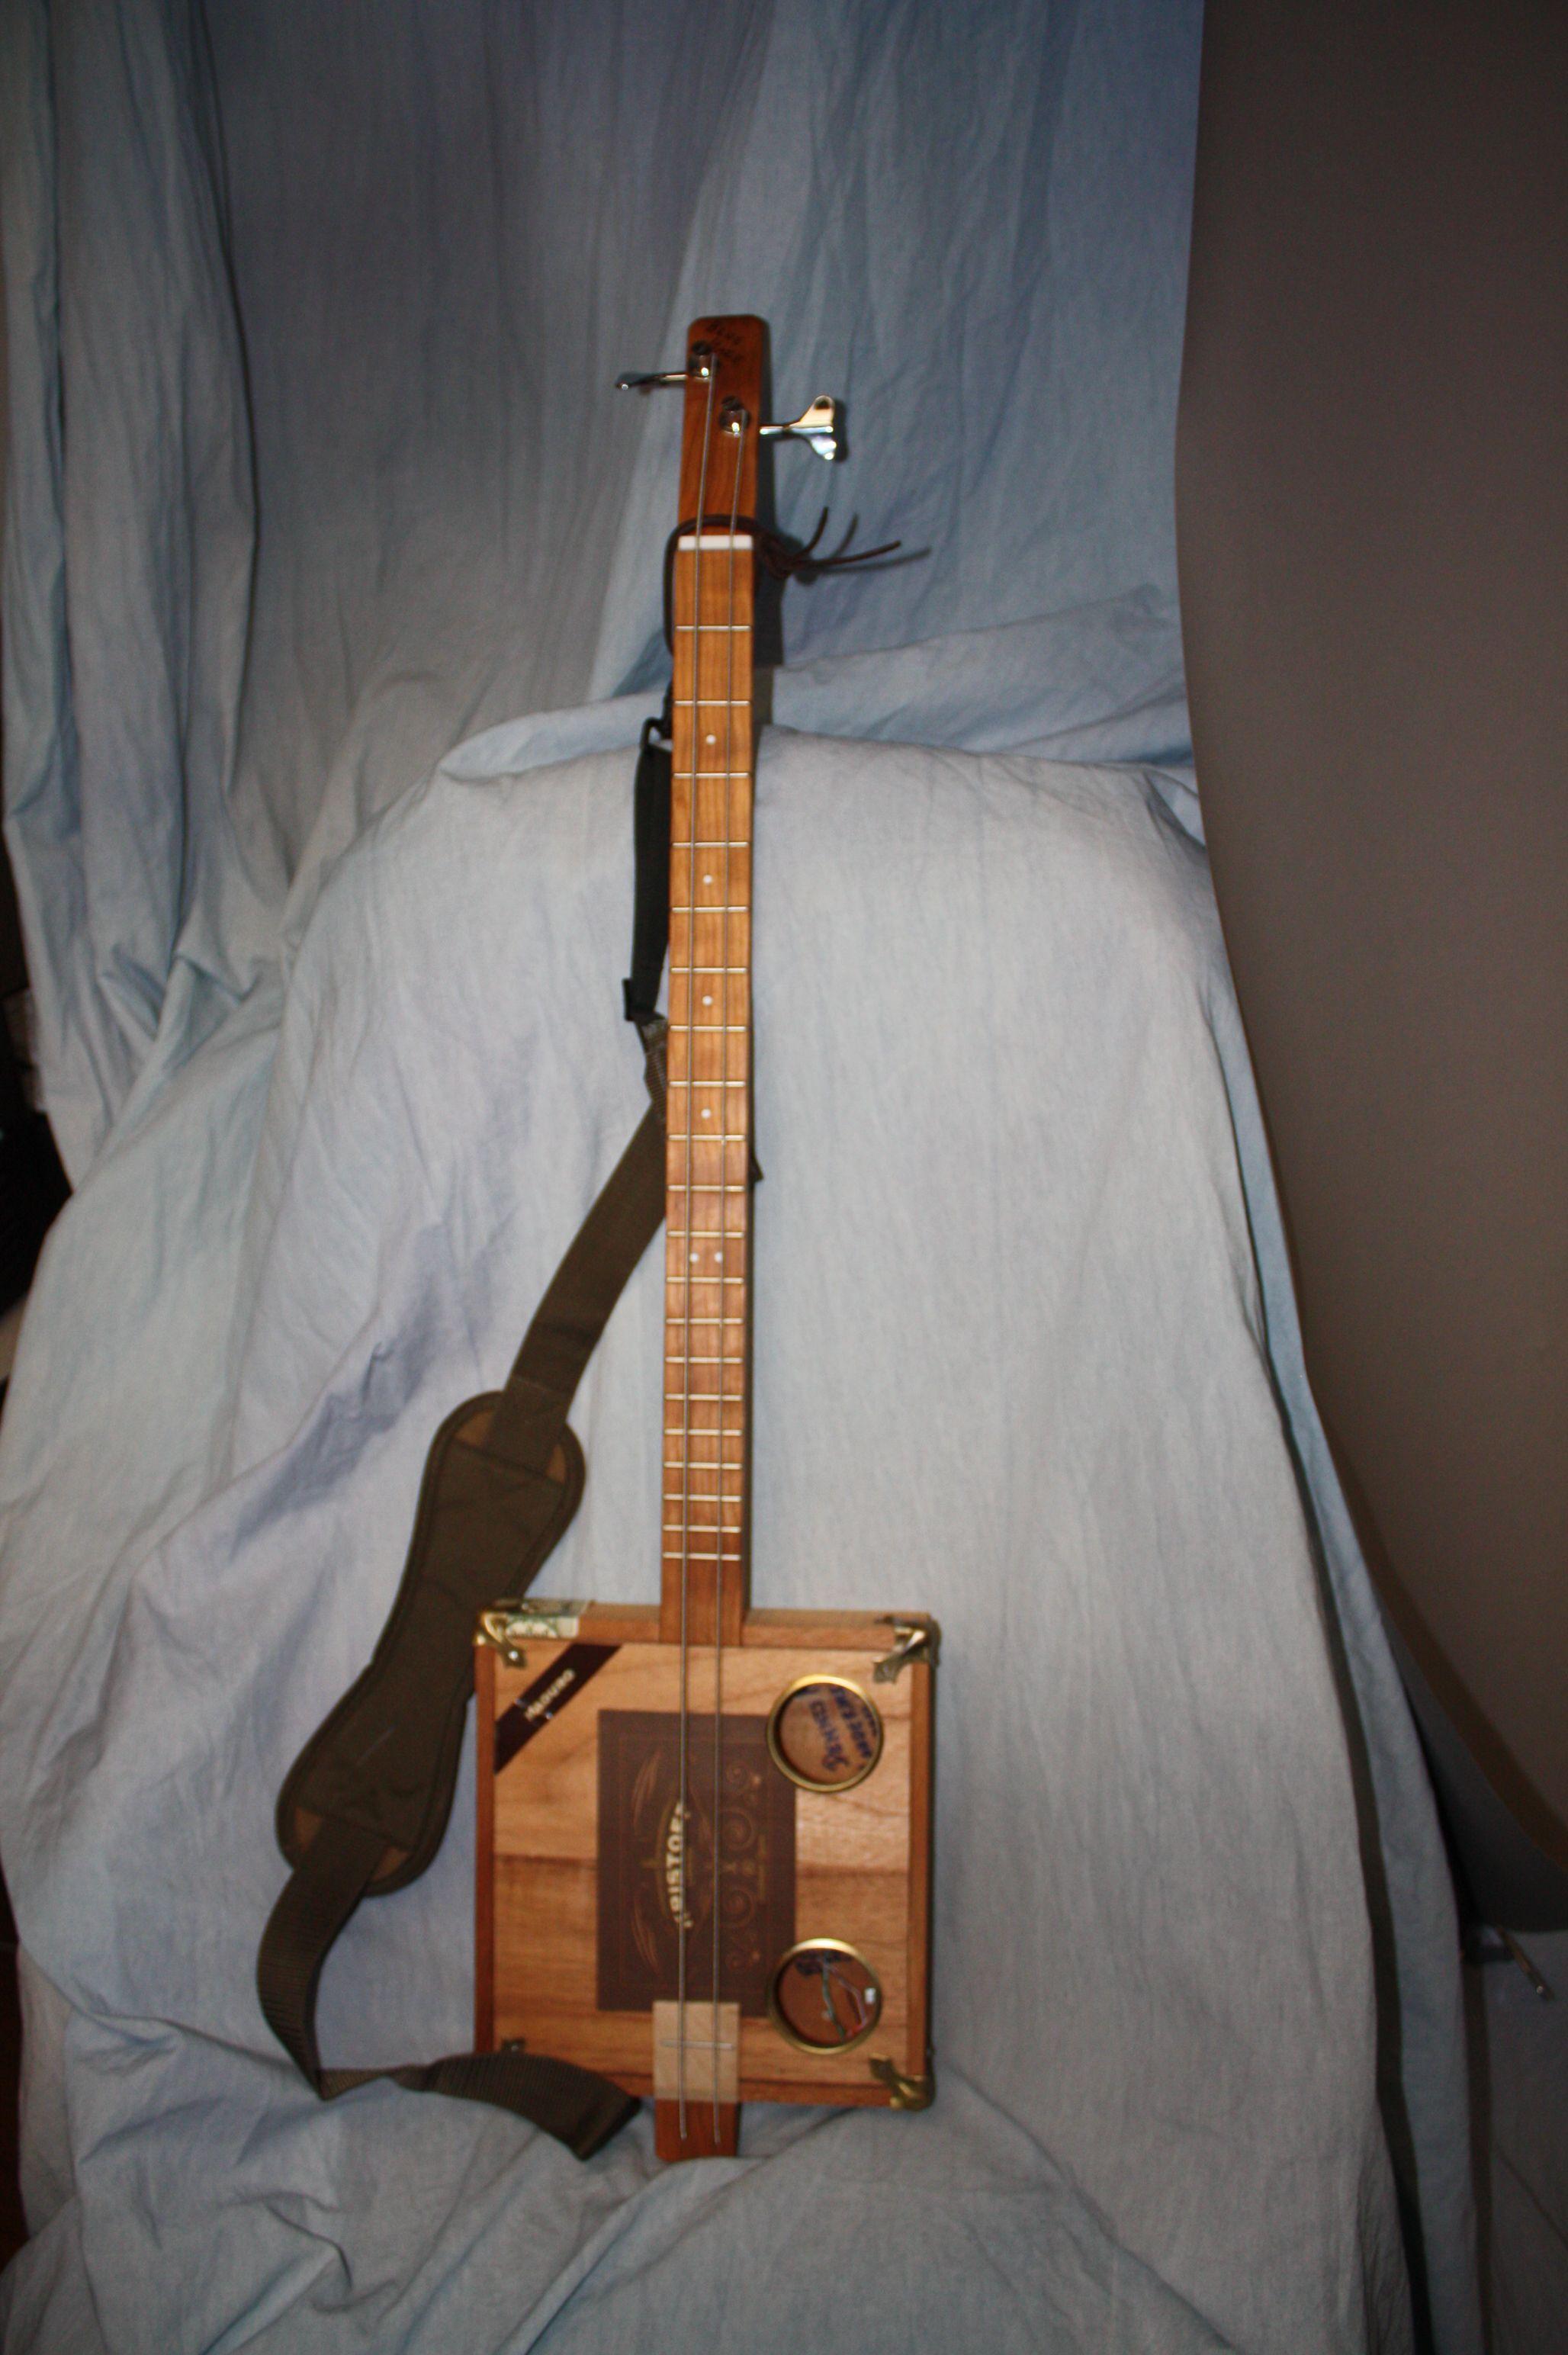 blue haze cigar box 2 string bass guitar shop music instruments guitar box guitar cigar. Black Bedroom Furniture Sets. Home Design Ideas